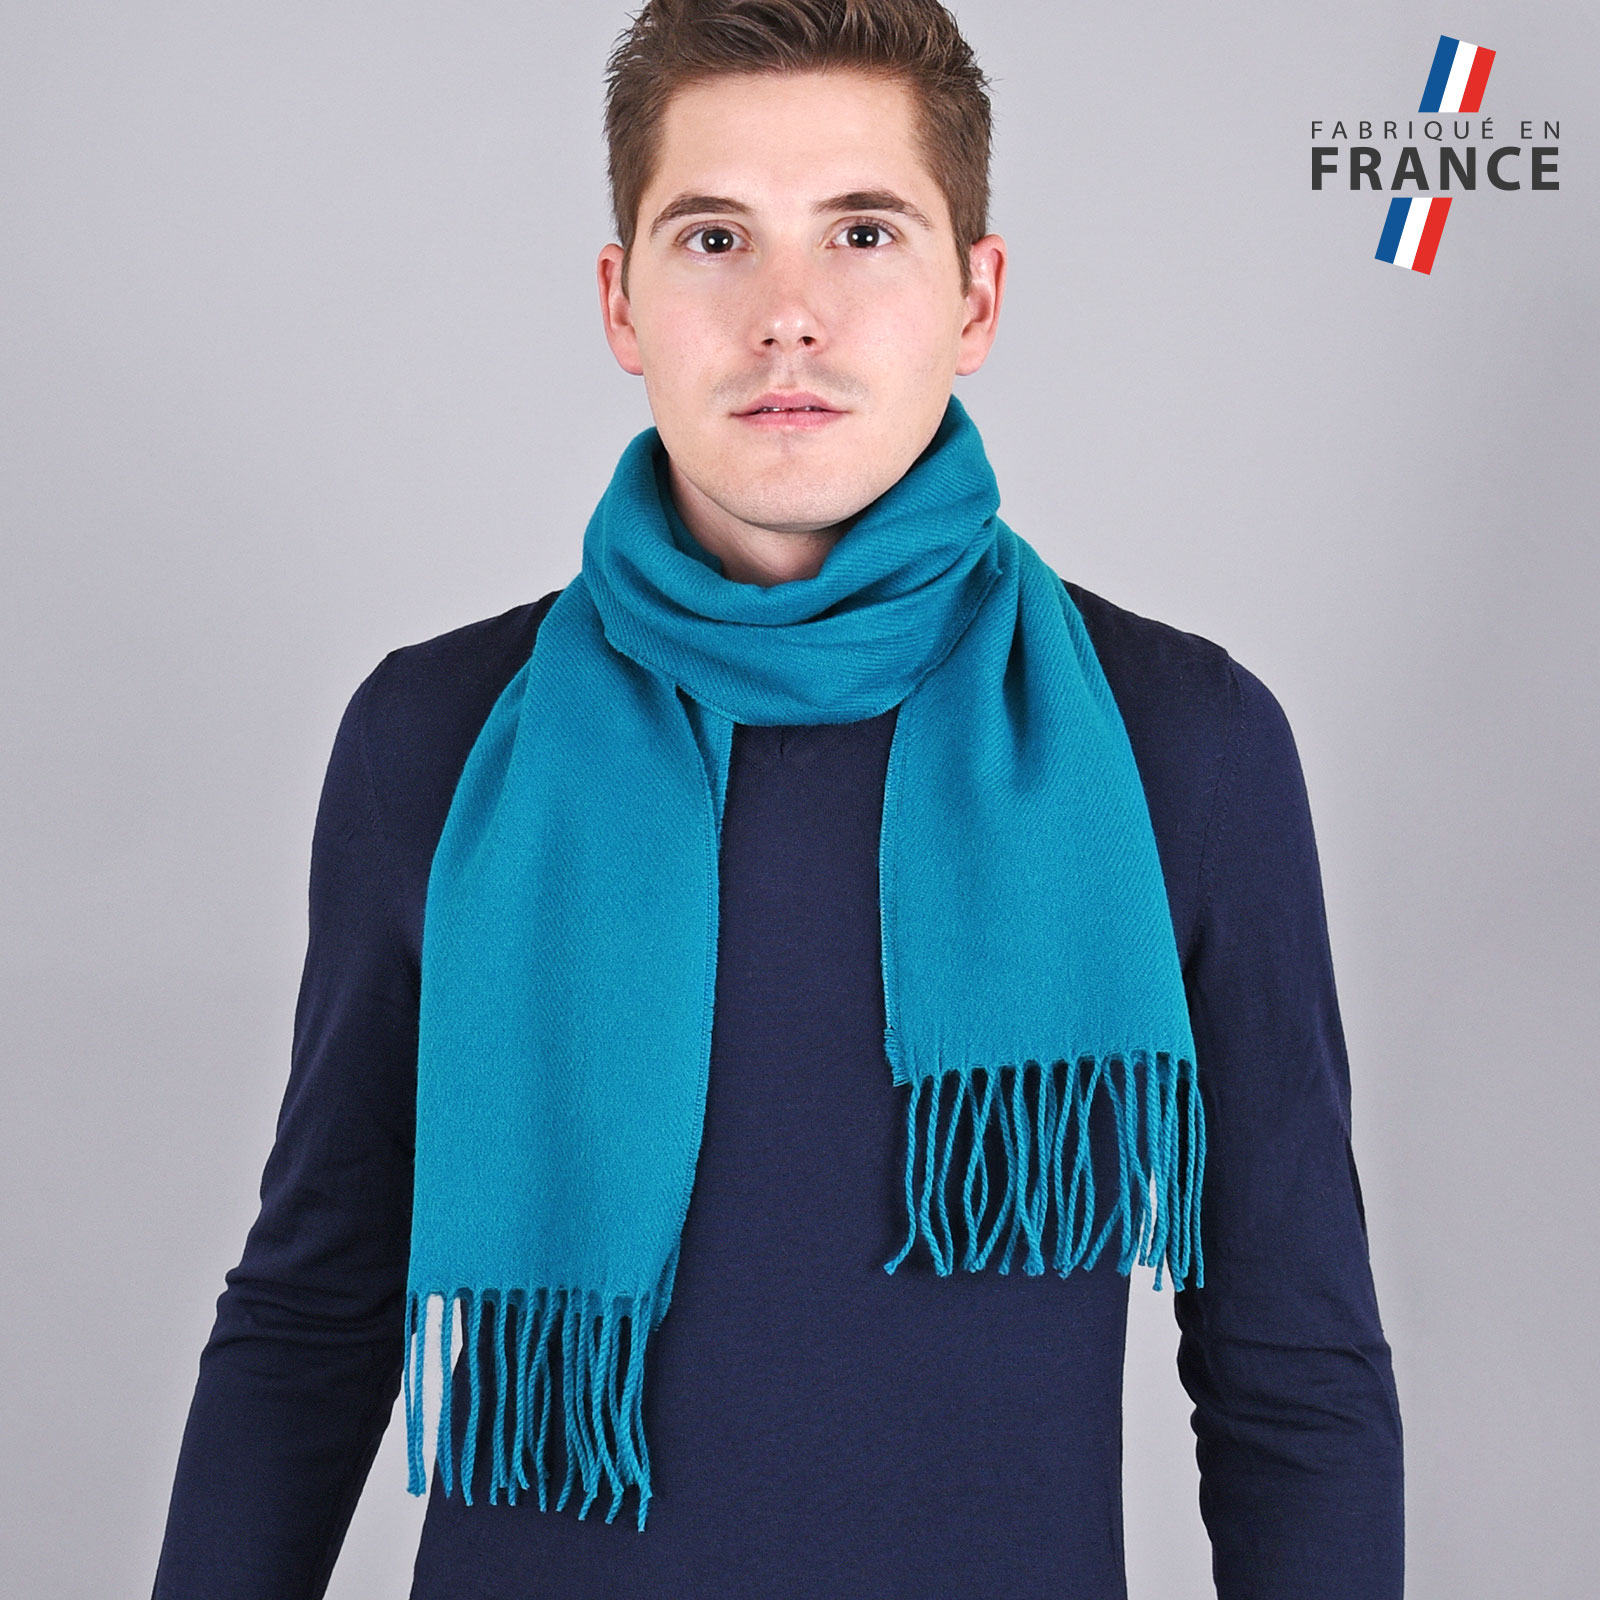 Echarpe franges bleu canard - Fabriqué en France 4caca60392e